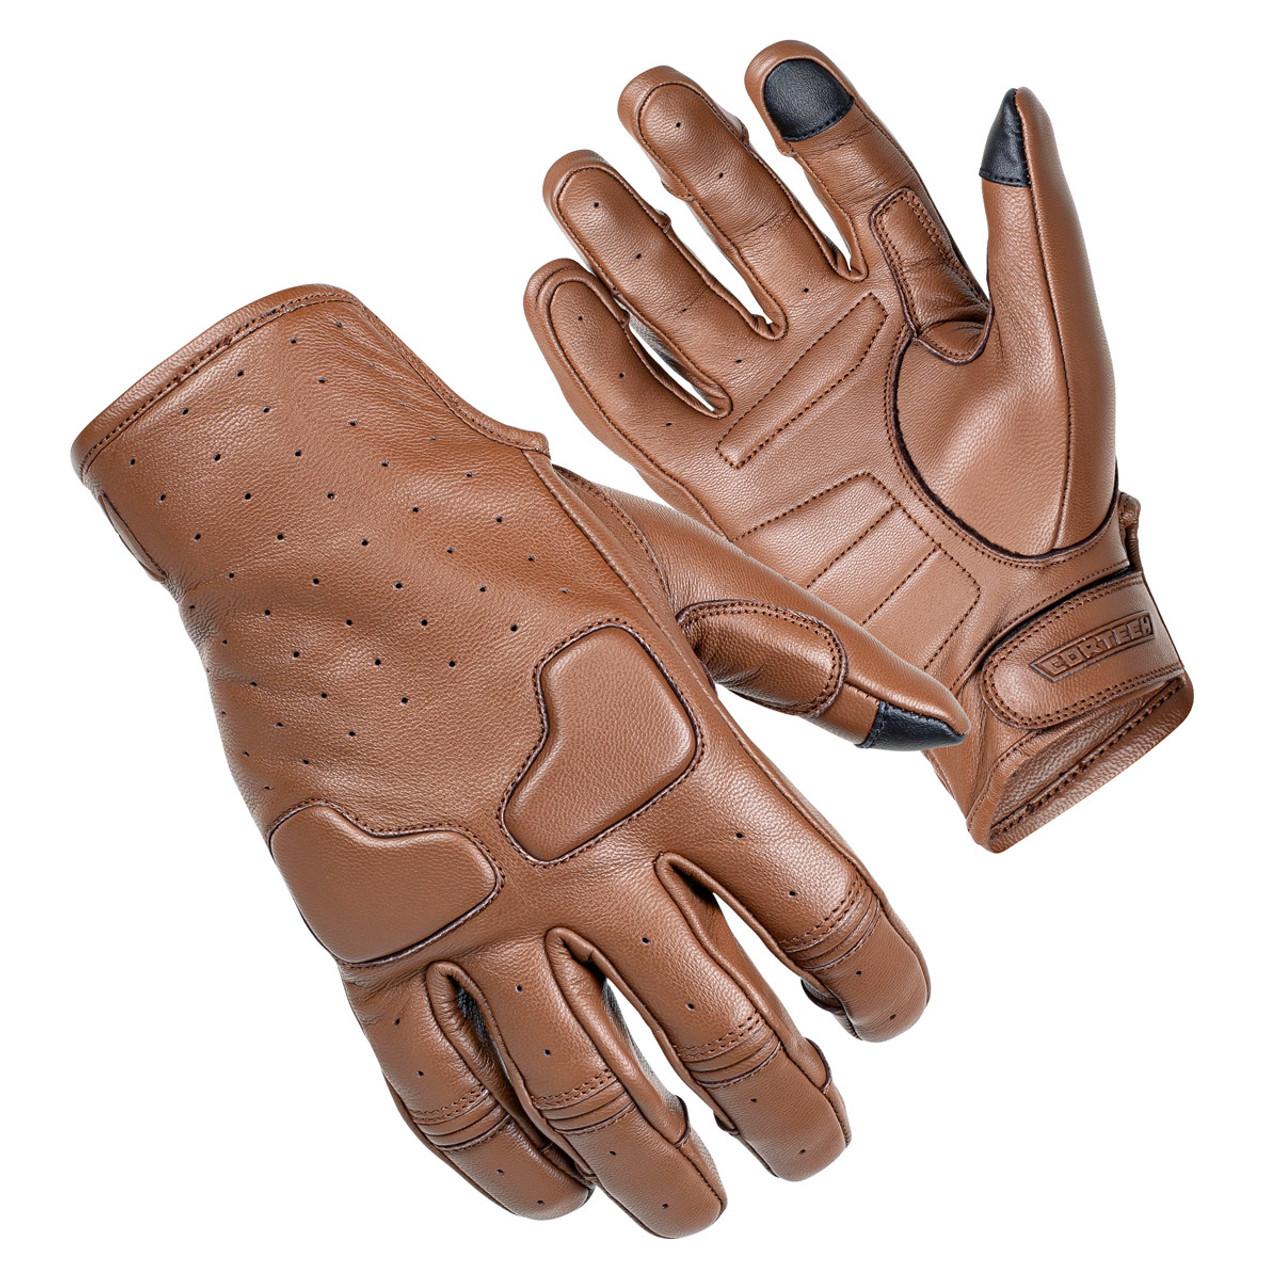 Men's reflective skull leather driving glove